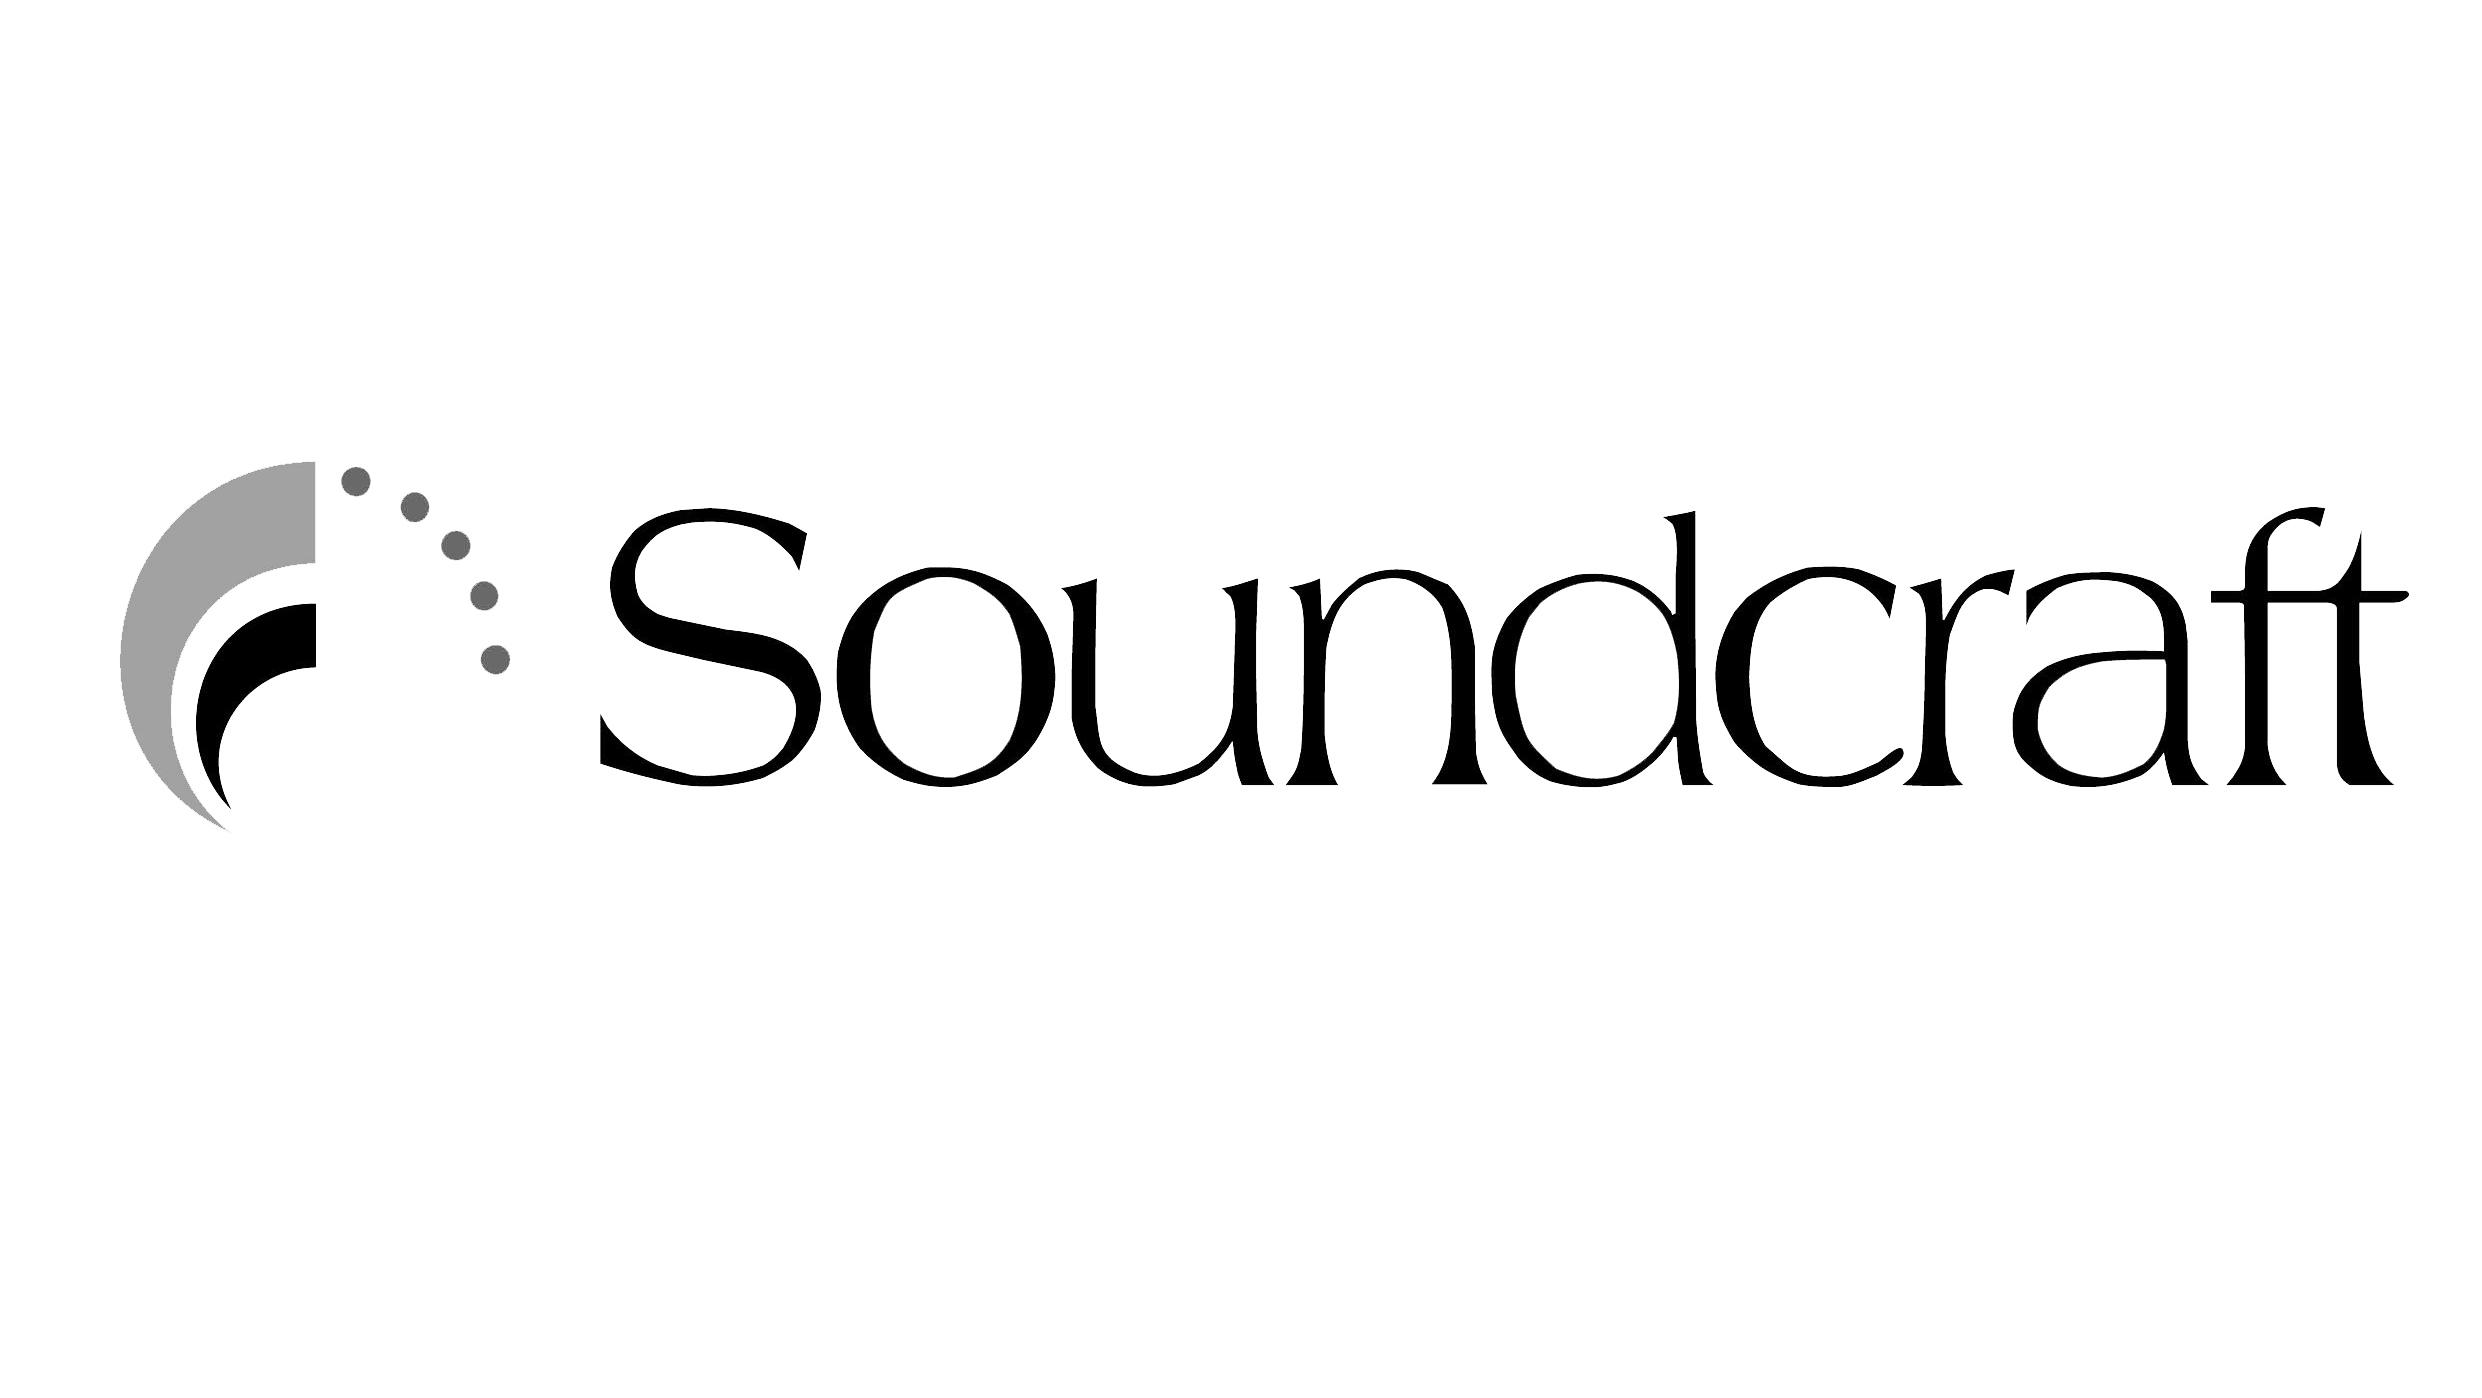 soundcraft_logodiscopiu